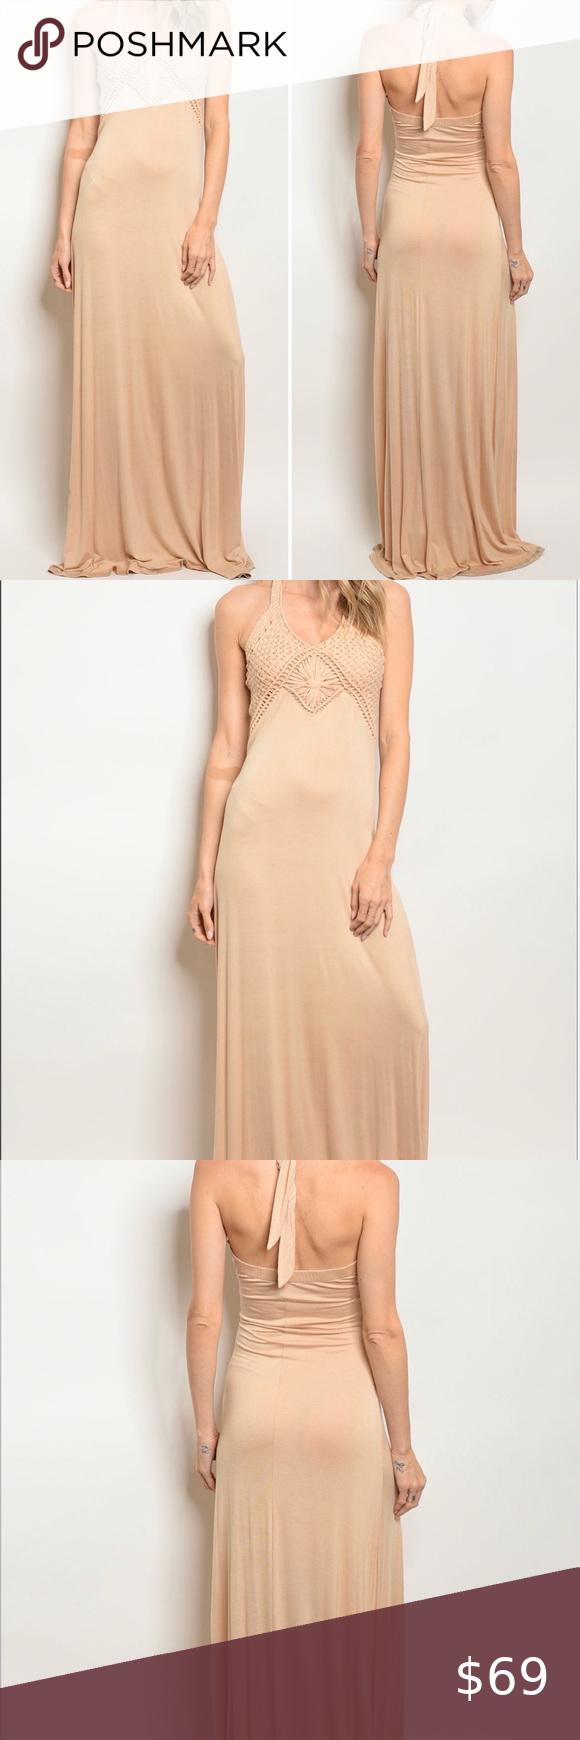 Tan Maxi Dress Maxi Dress Halter Sundress Dresses [ 1740 x 580 Pixel ]